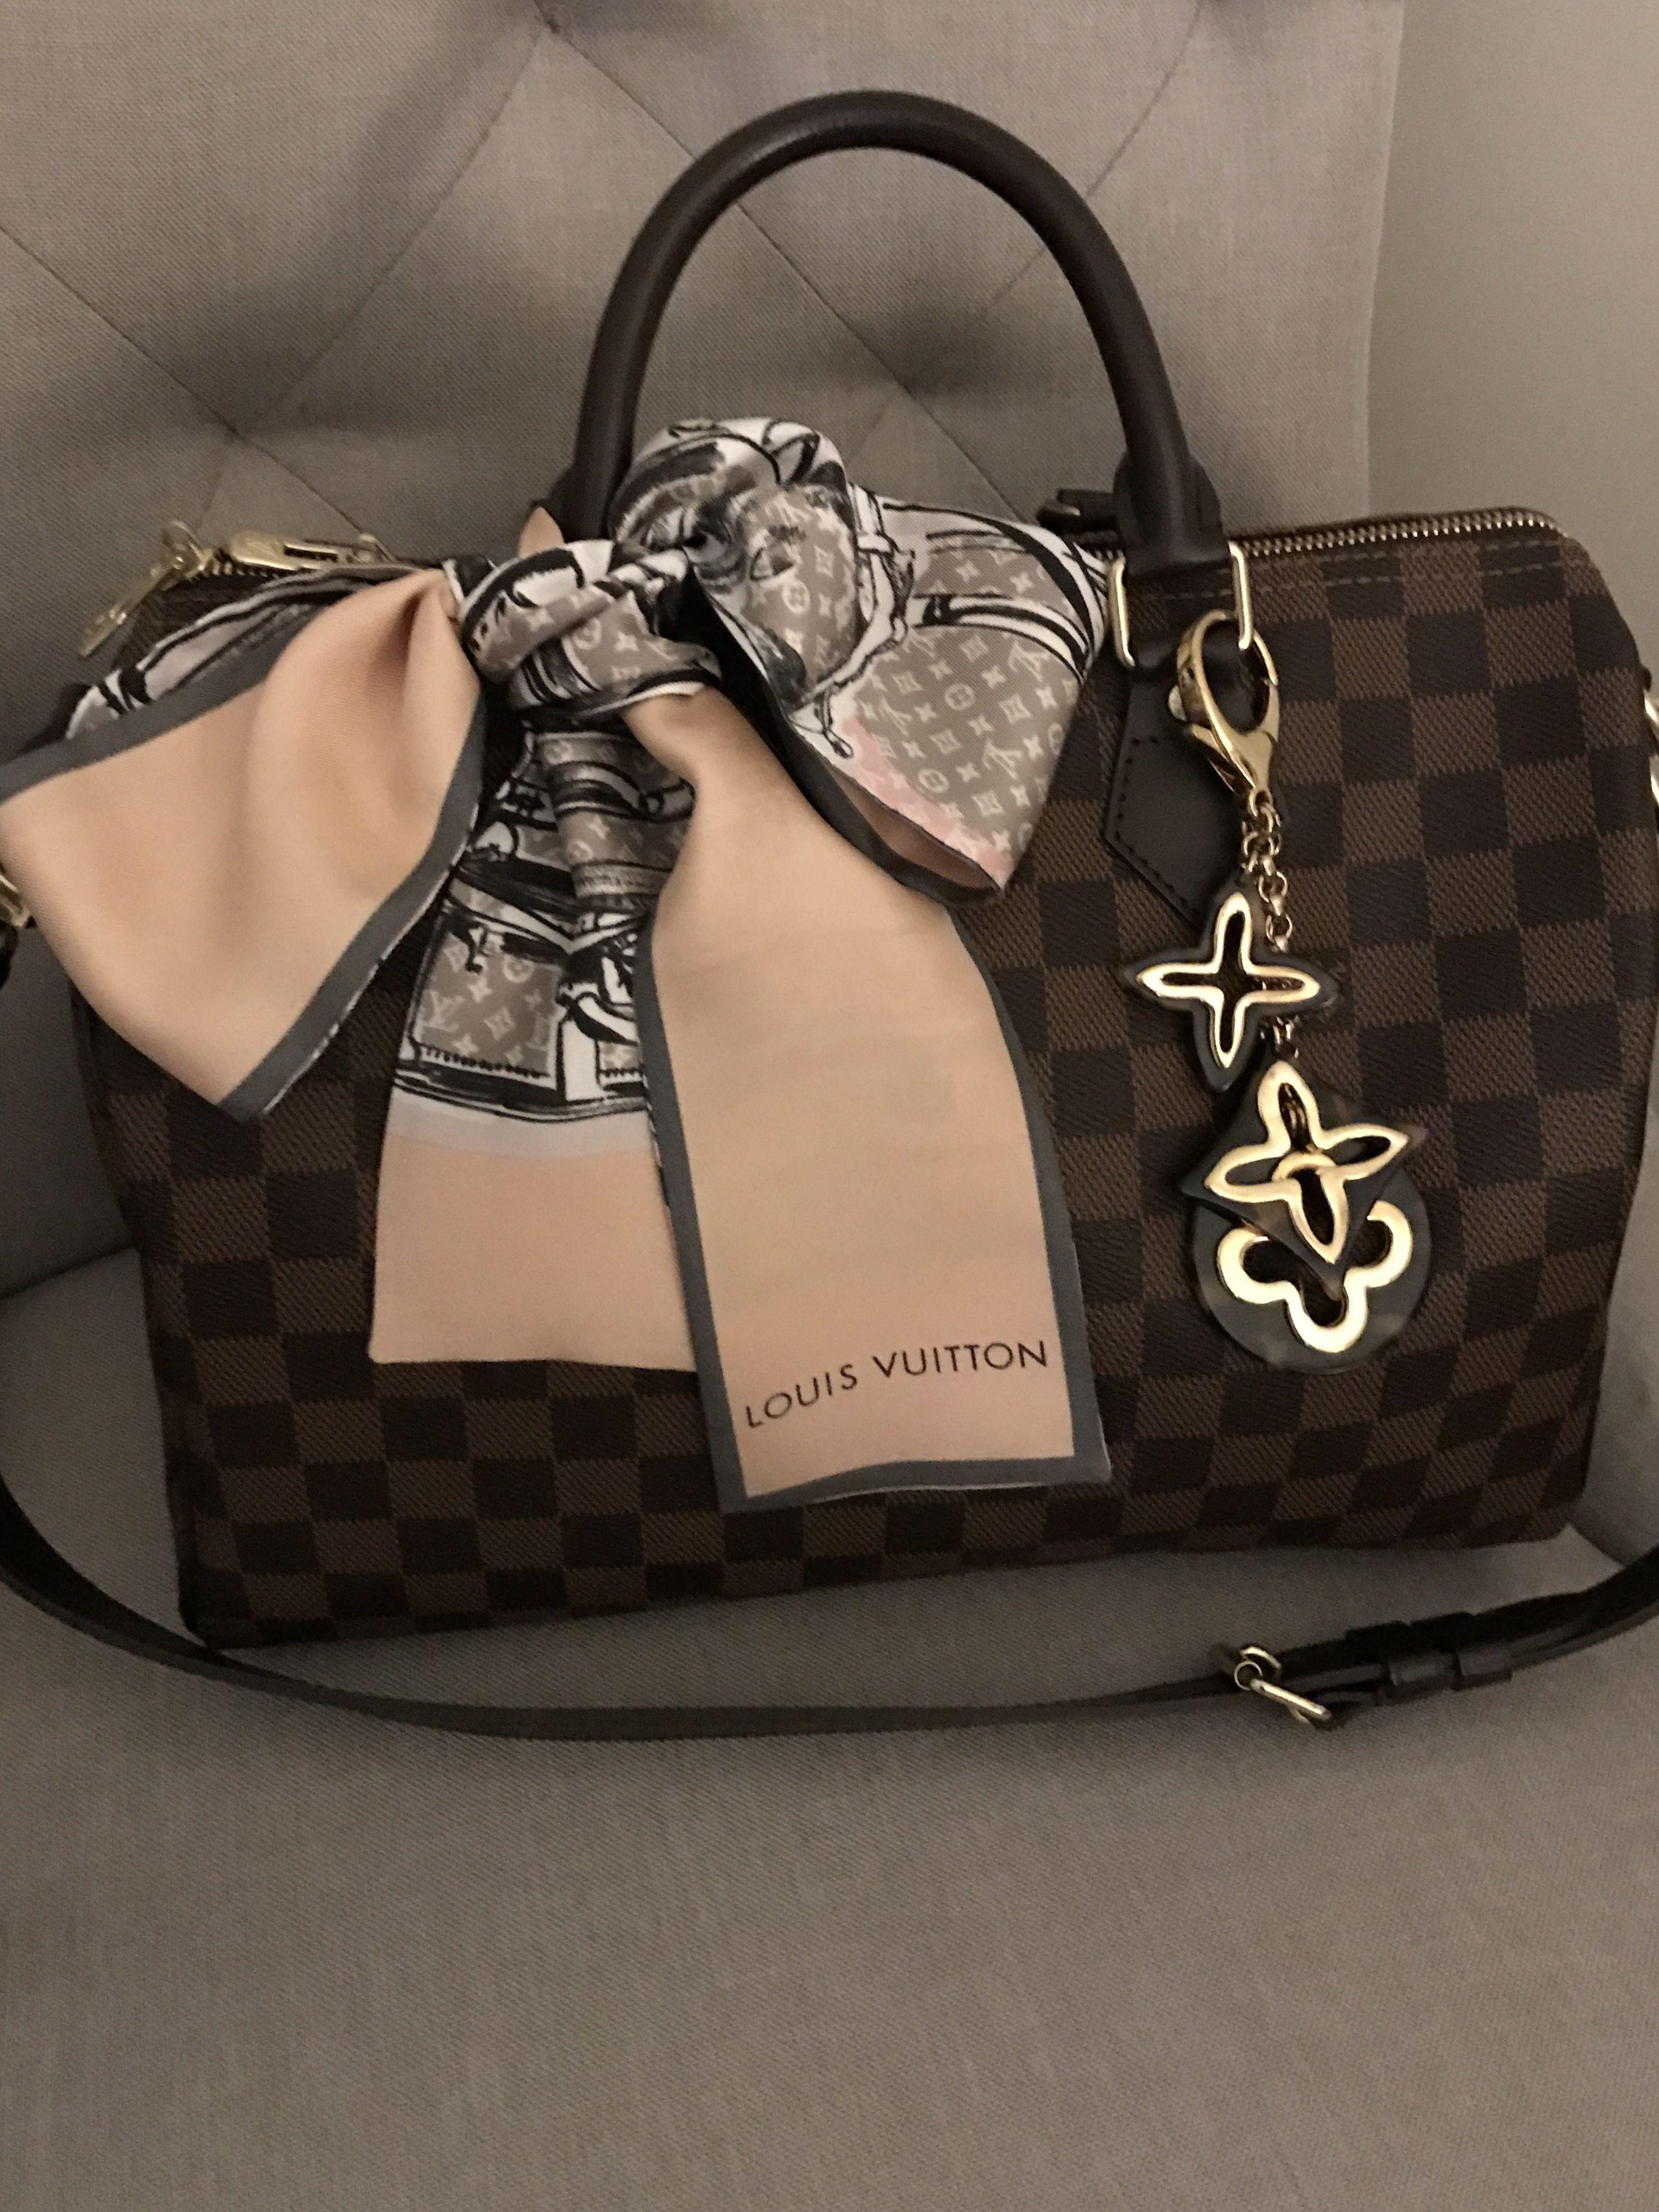 Louis Vuitton speedy b 30 damier ebene.... so pretty with lv bandeau and  charm a9772f01eacbc